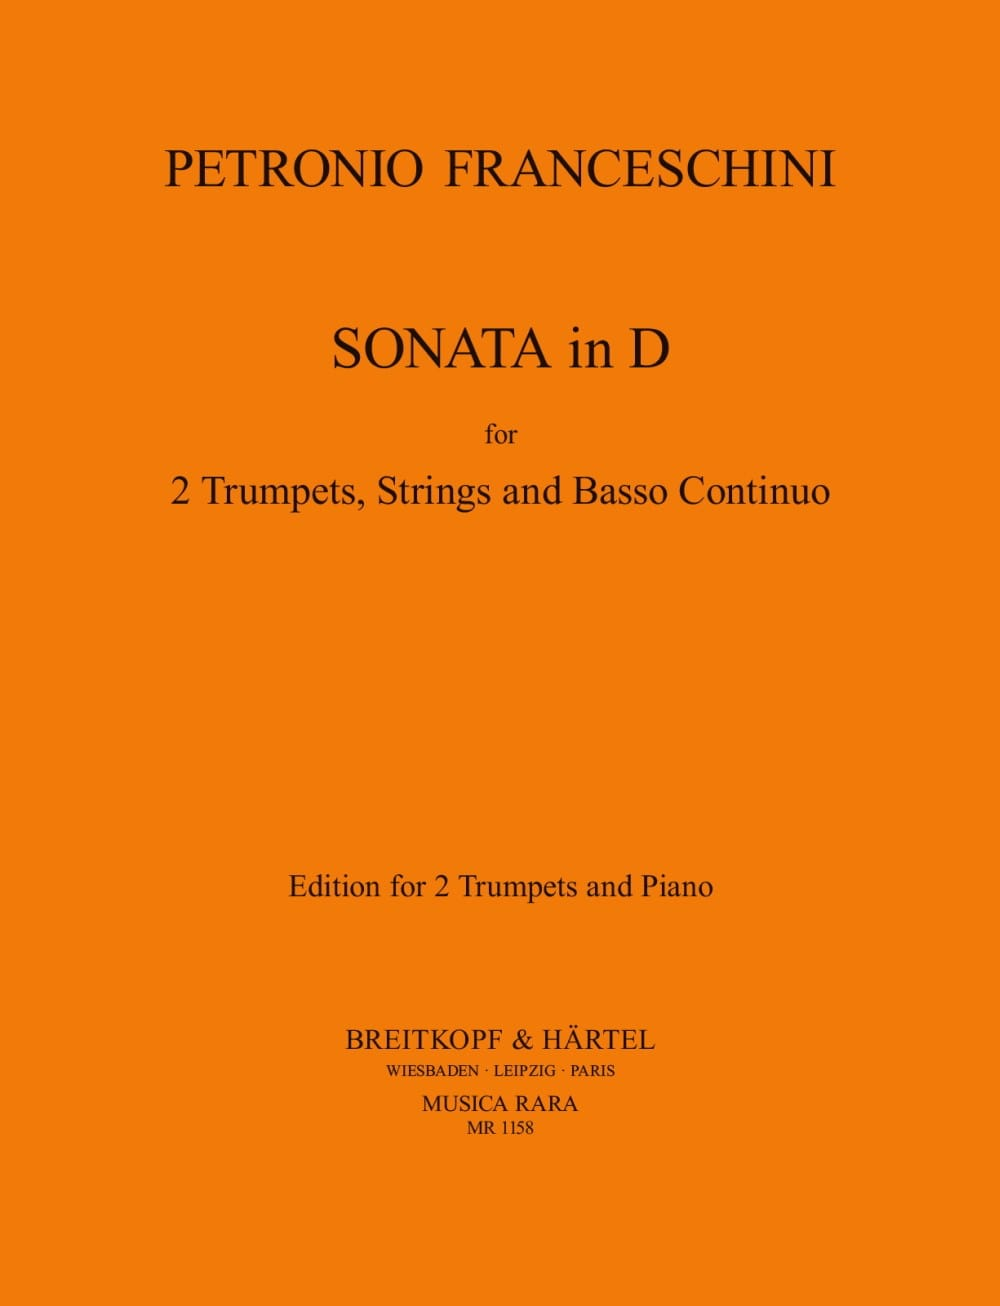 Sonata In D - P. Franceschini - Partition - laflutedepan.com